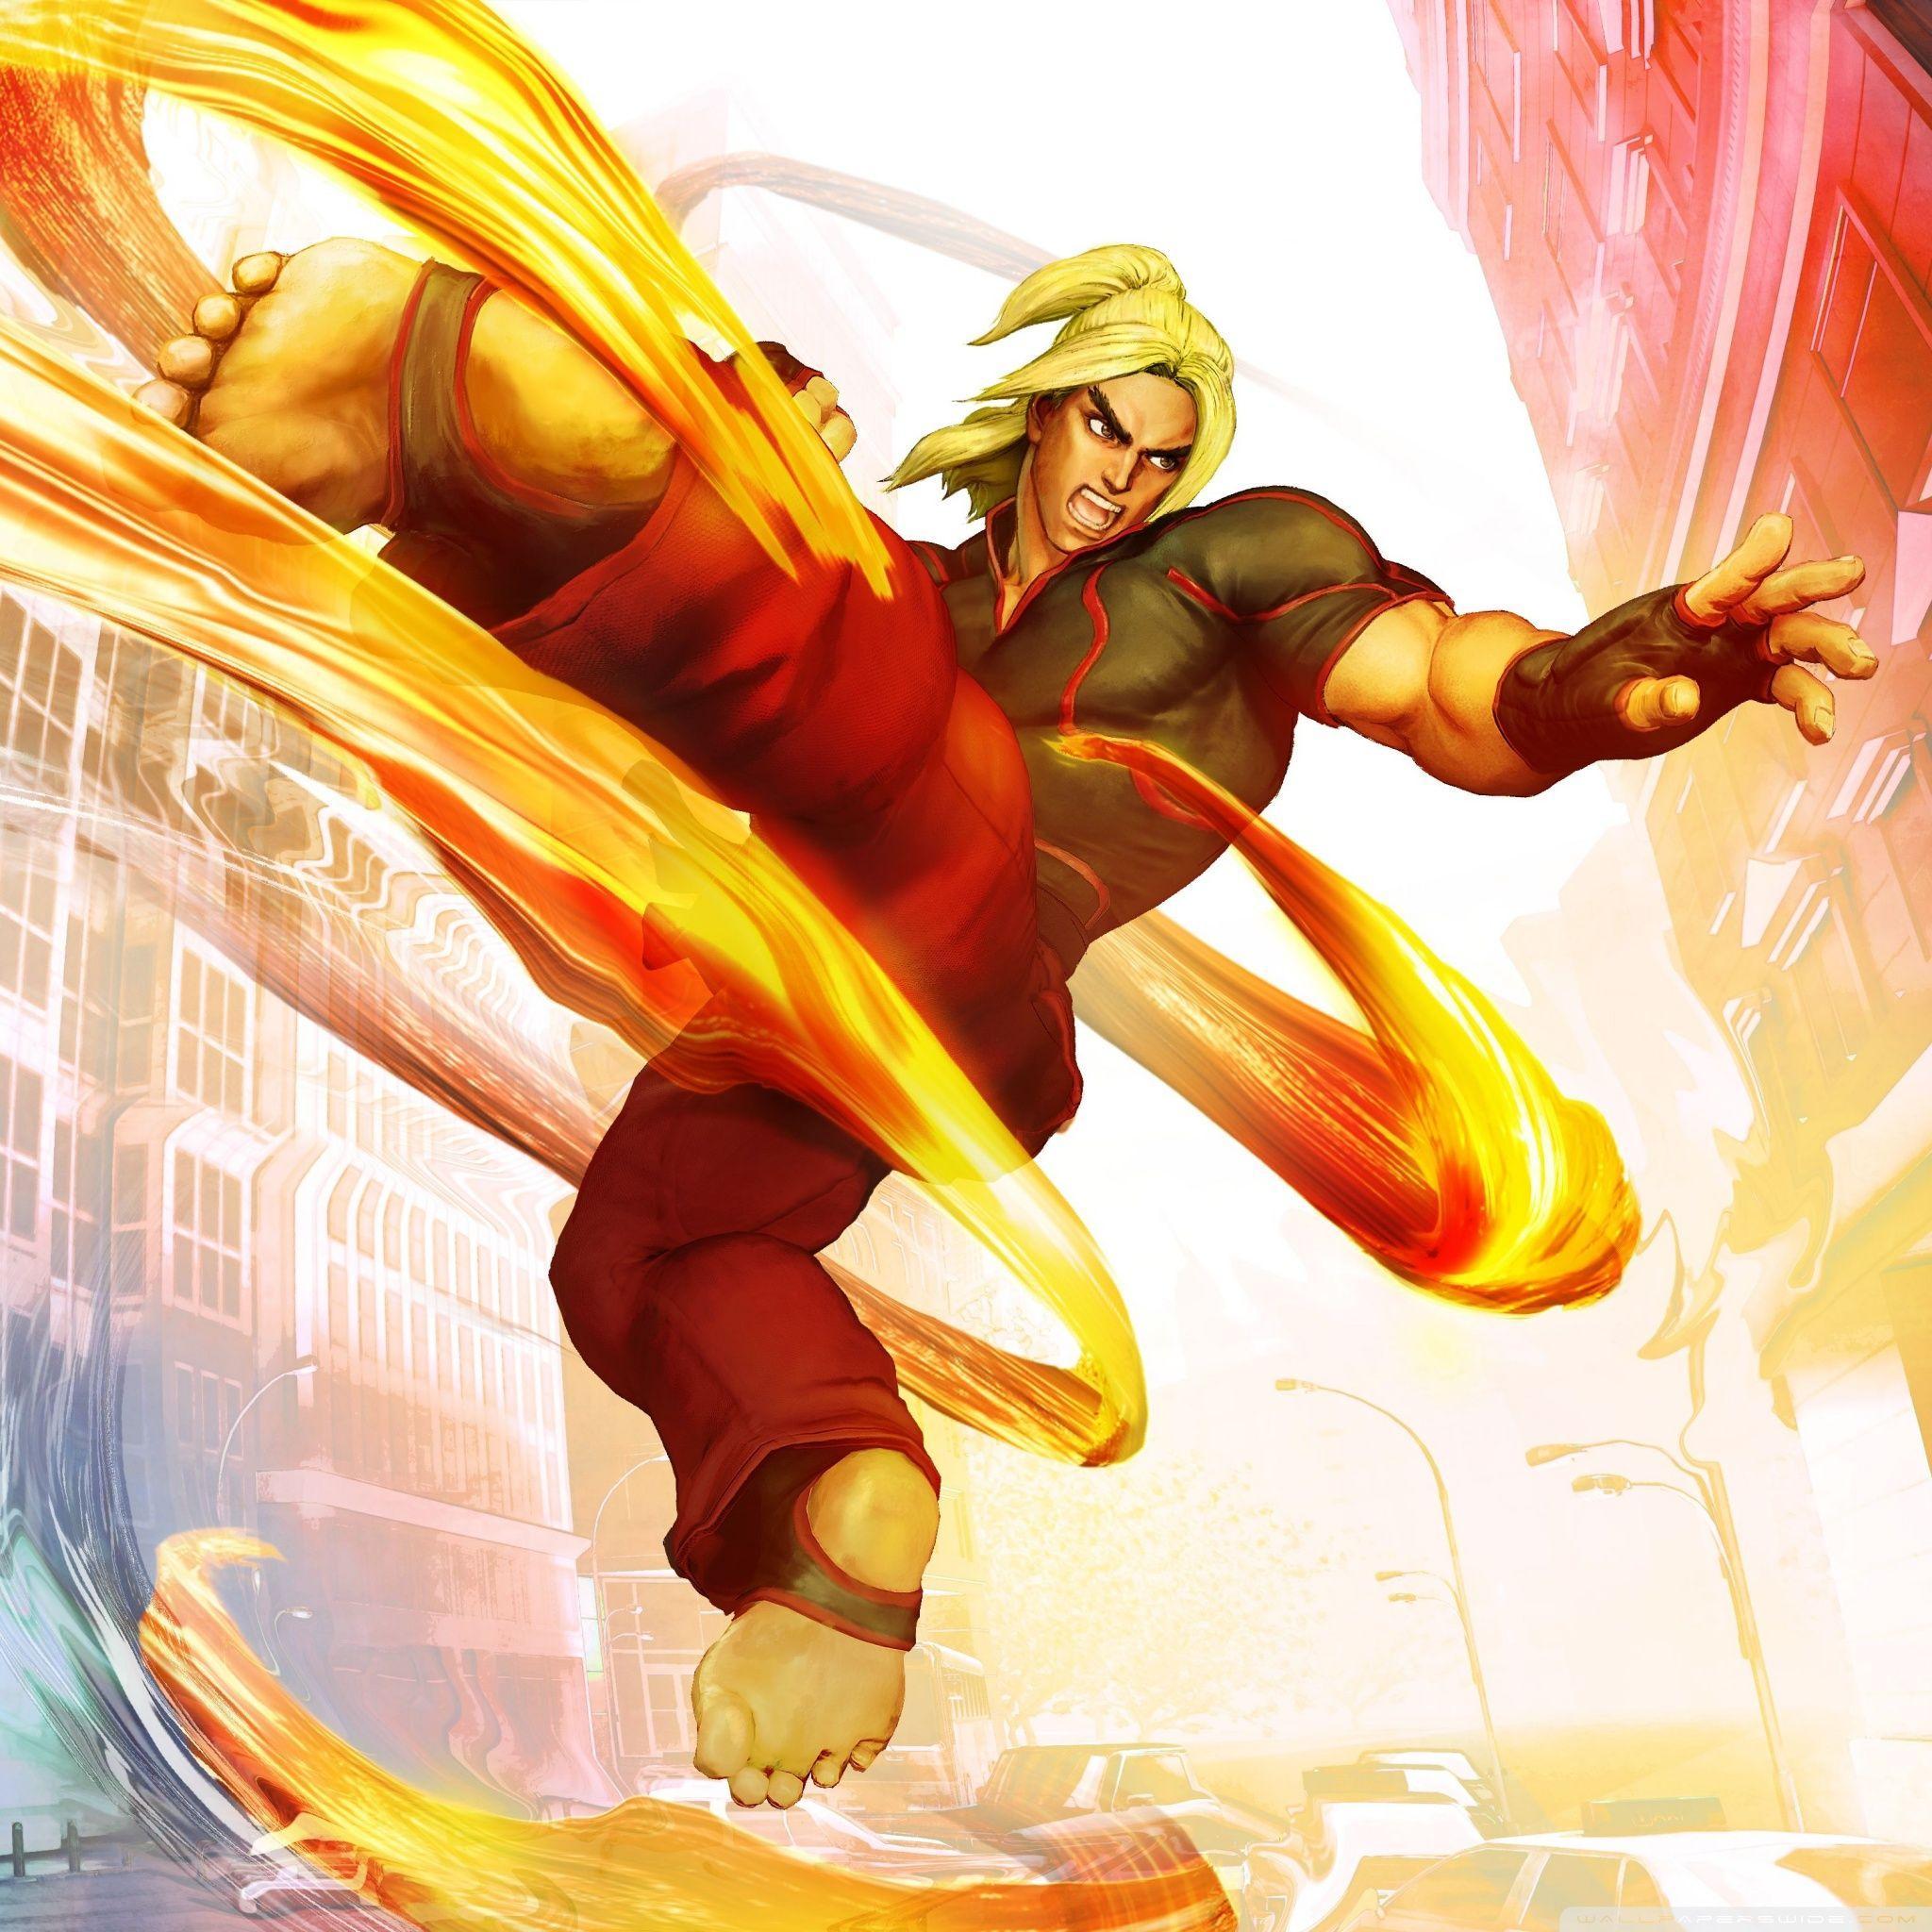 Street Fighter Ken Wallpapers - Wallpaper Cave